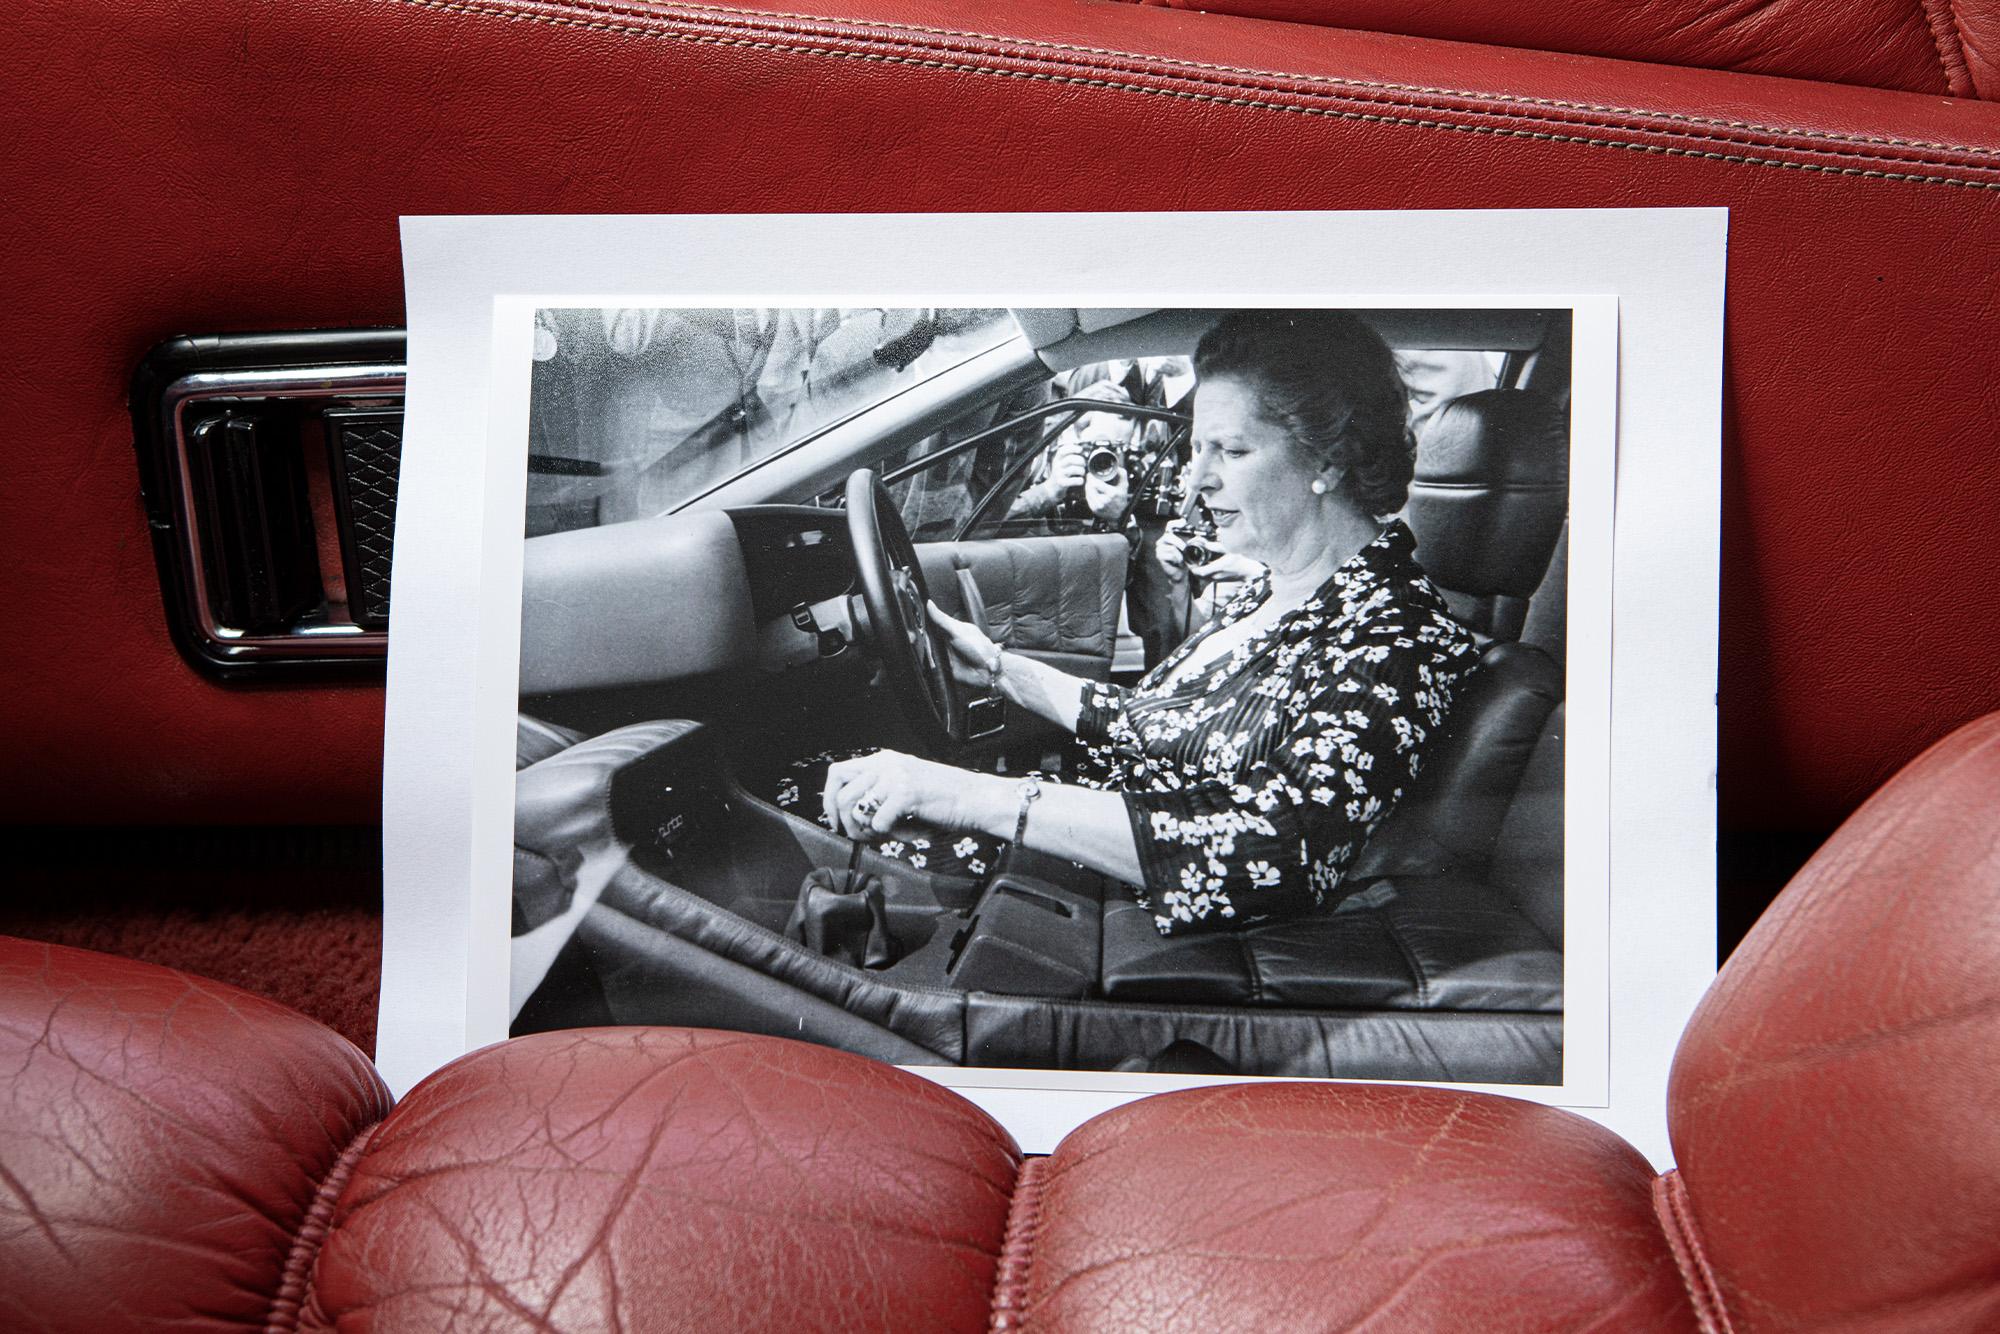 Thatcher driving Esprit